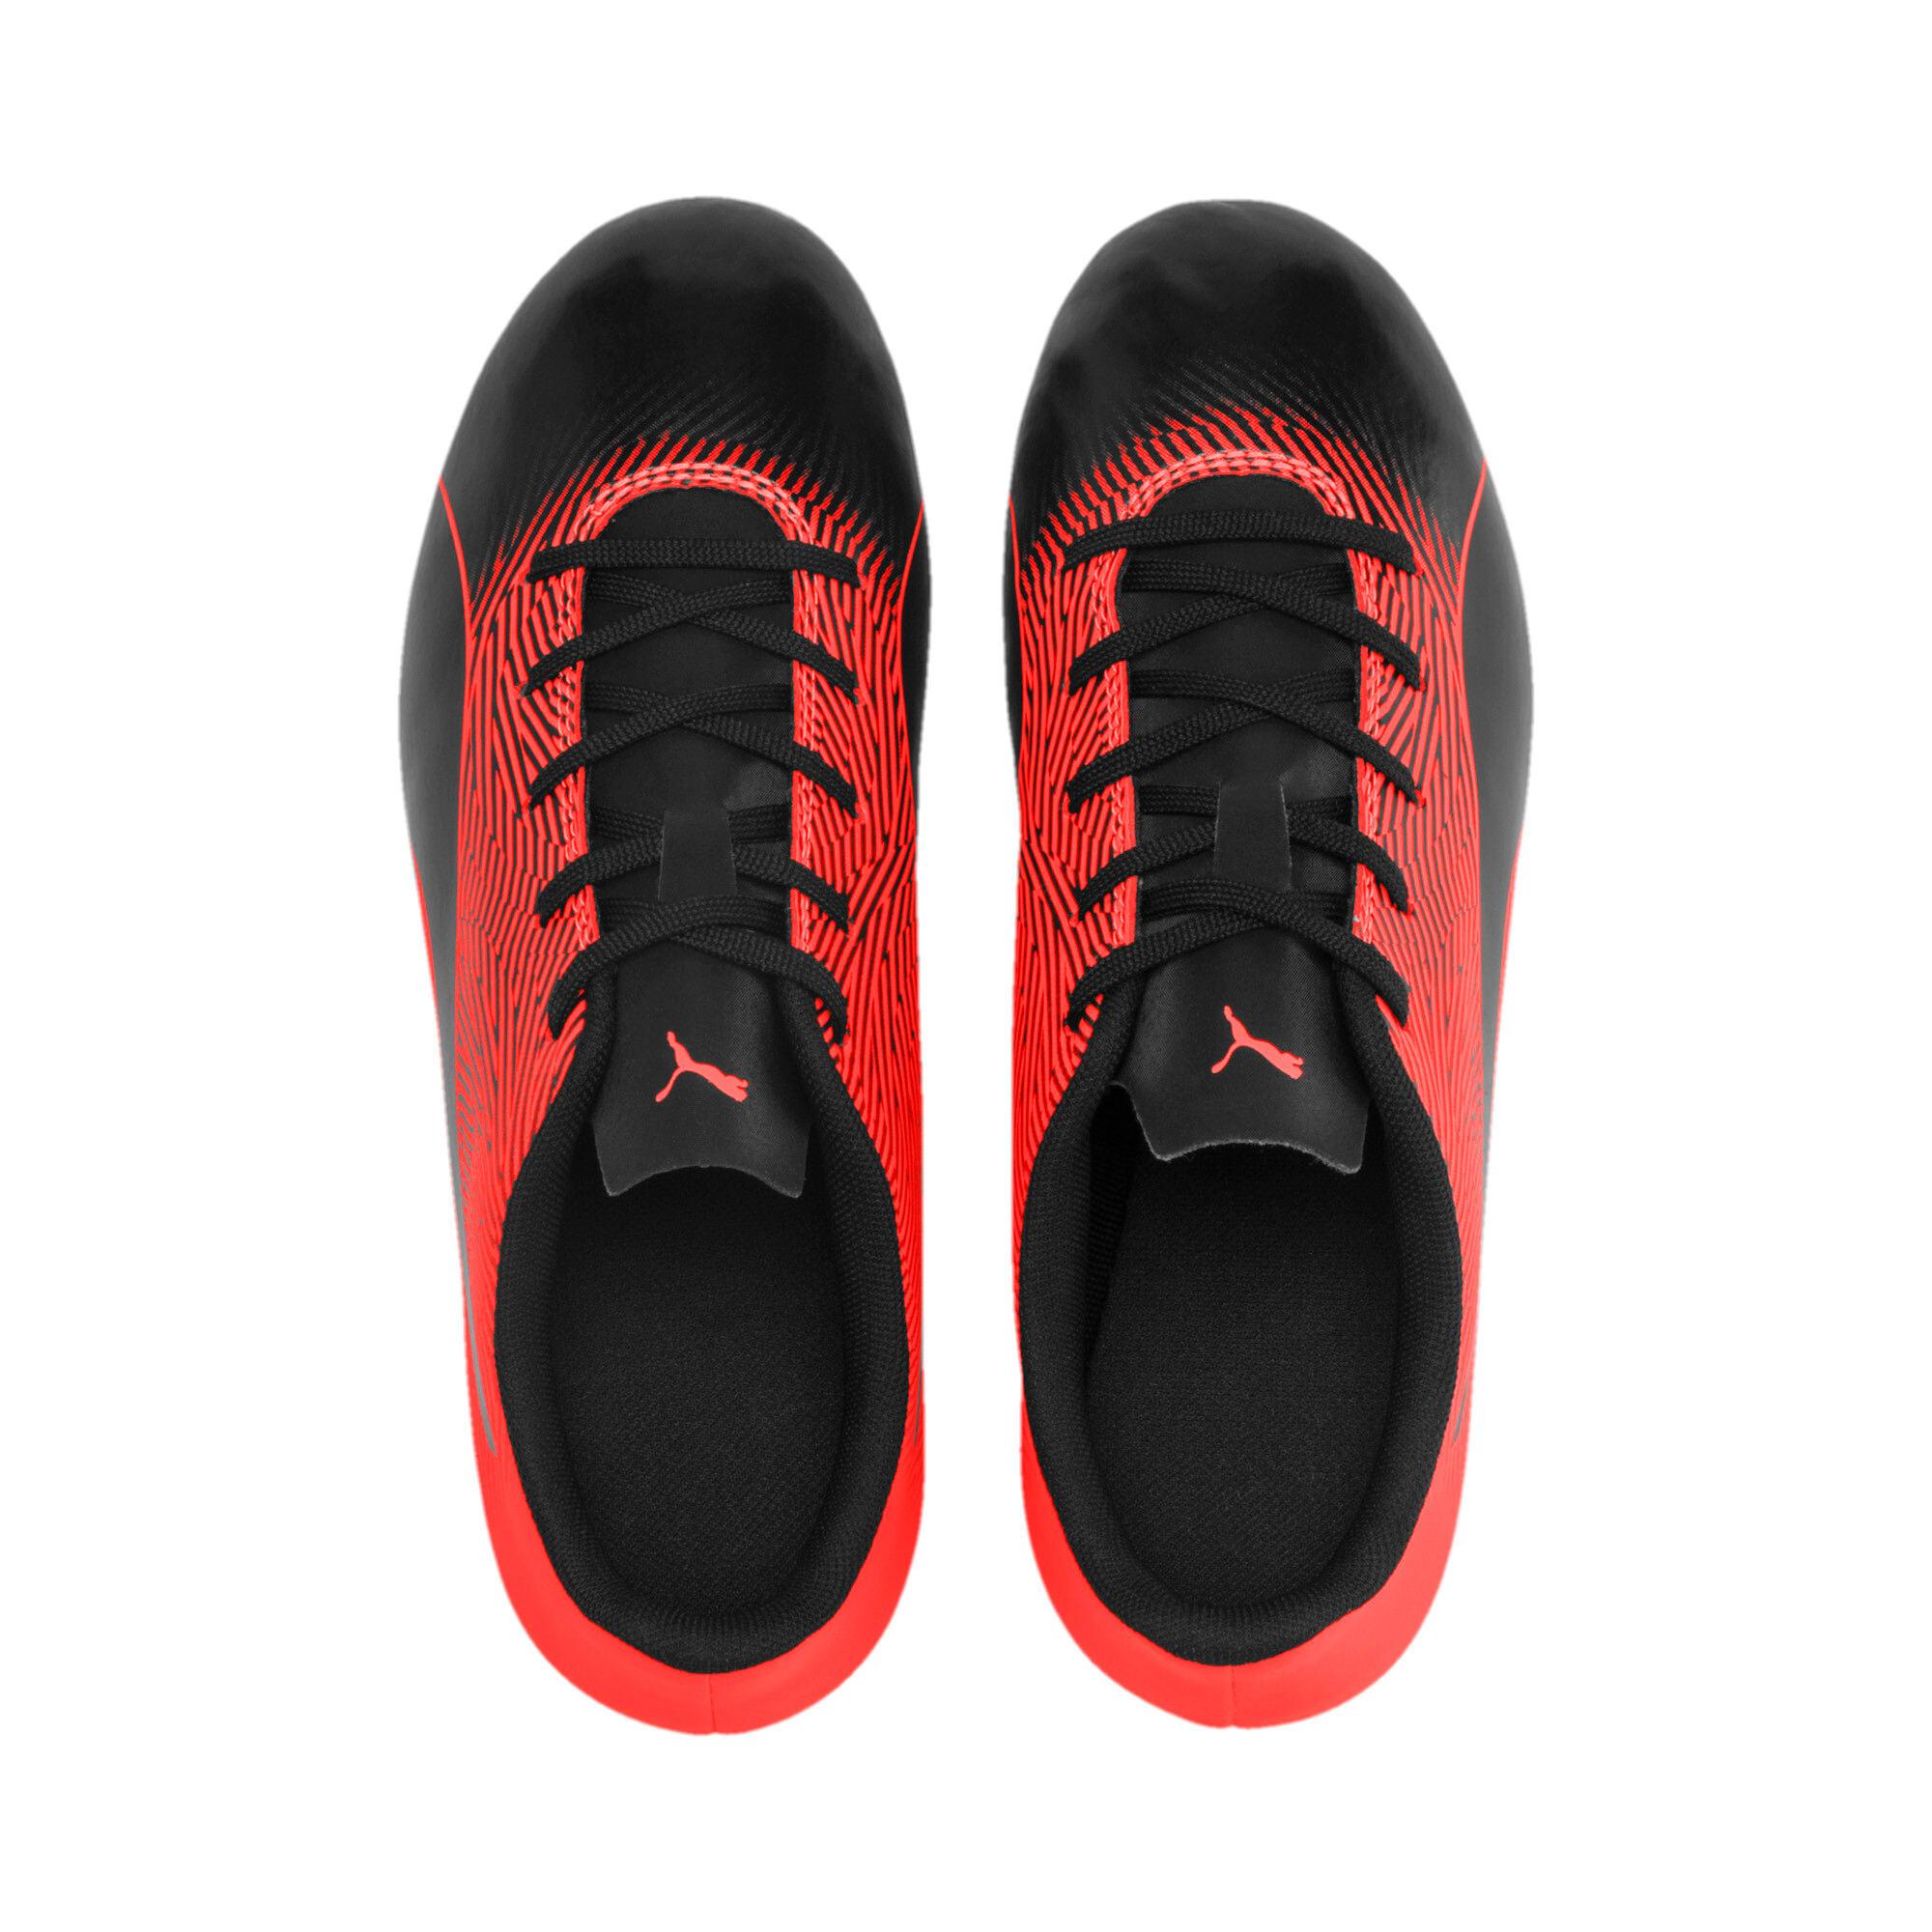 Thumbnail 2 of PUMA Spirit II FG Youth Football Boots, Puma Black-Nrgy Red, medium-IND